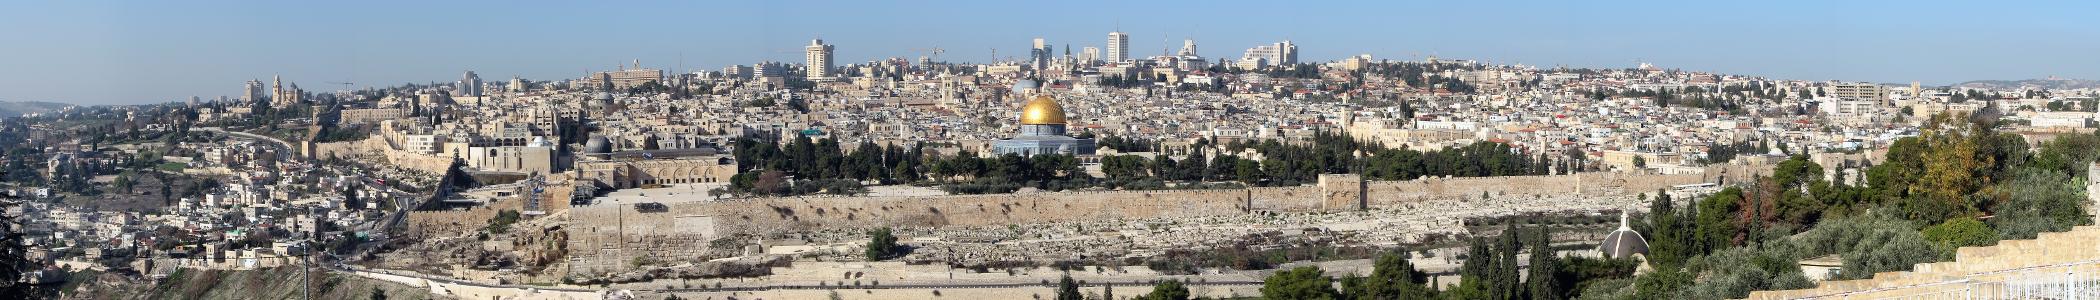 Jerusalem_banner_Panorama